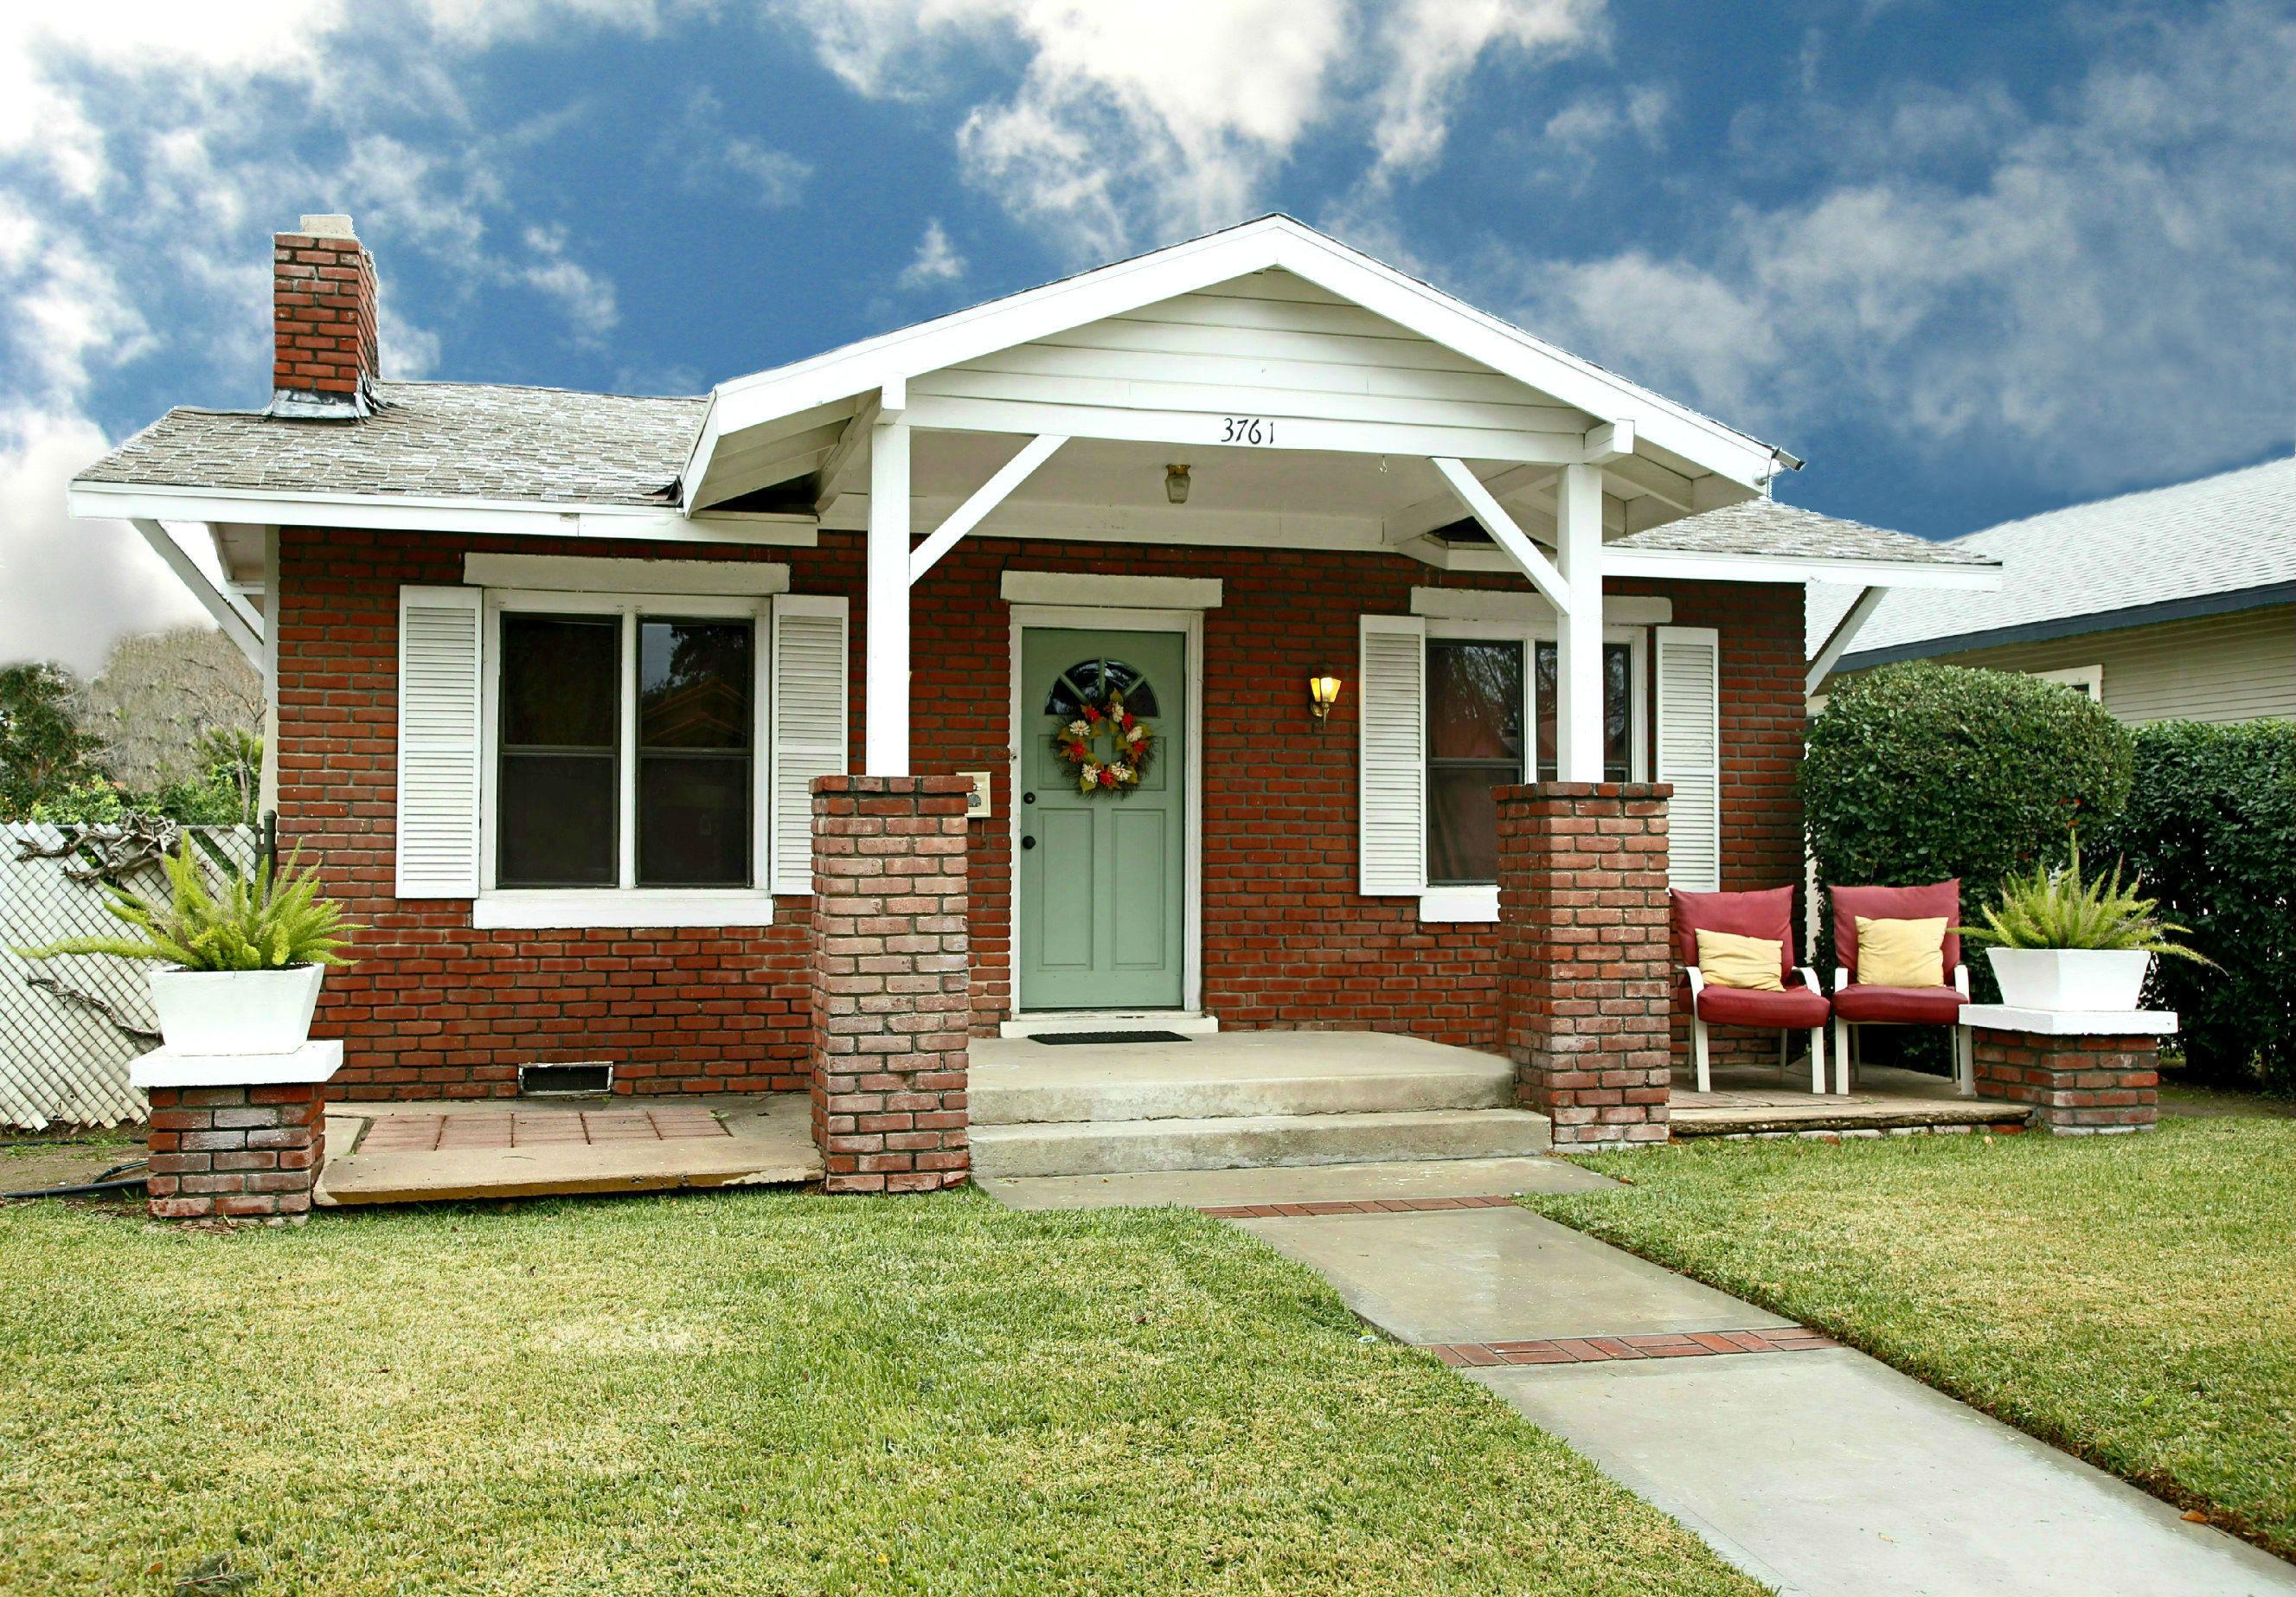 3761 Rosewood Pl., Riverside